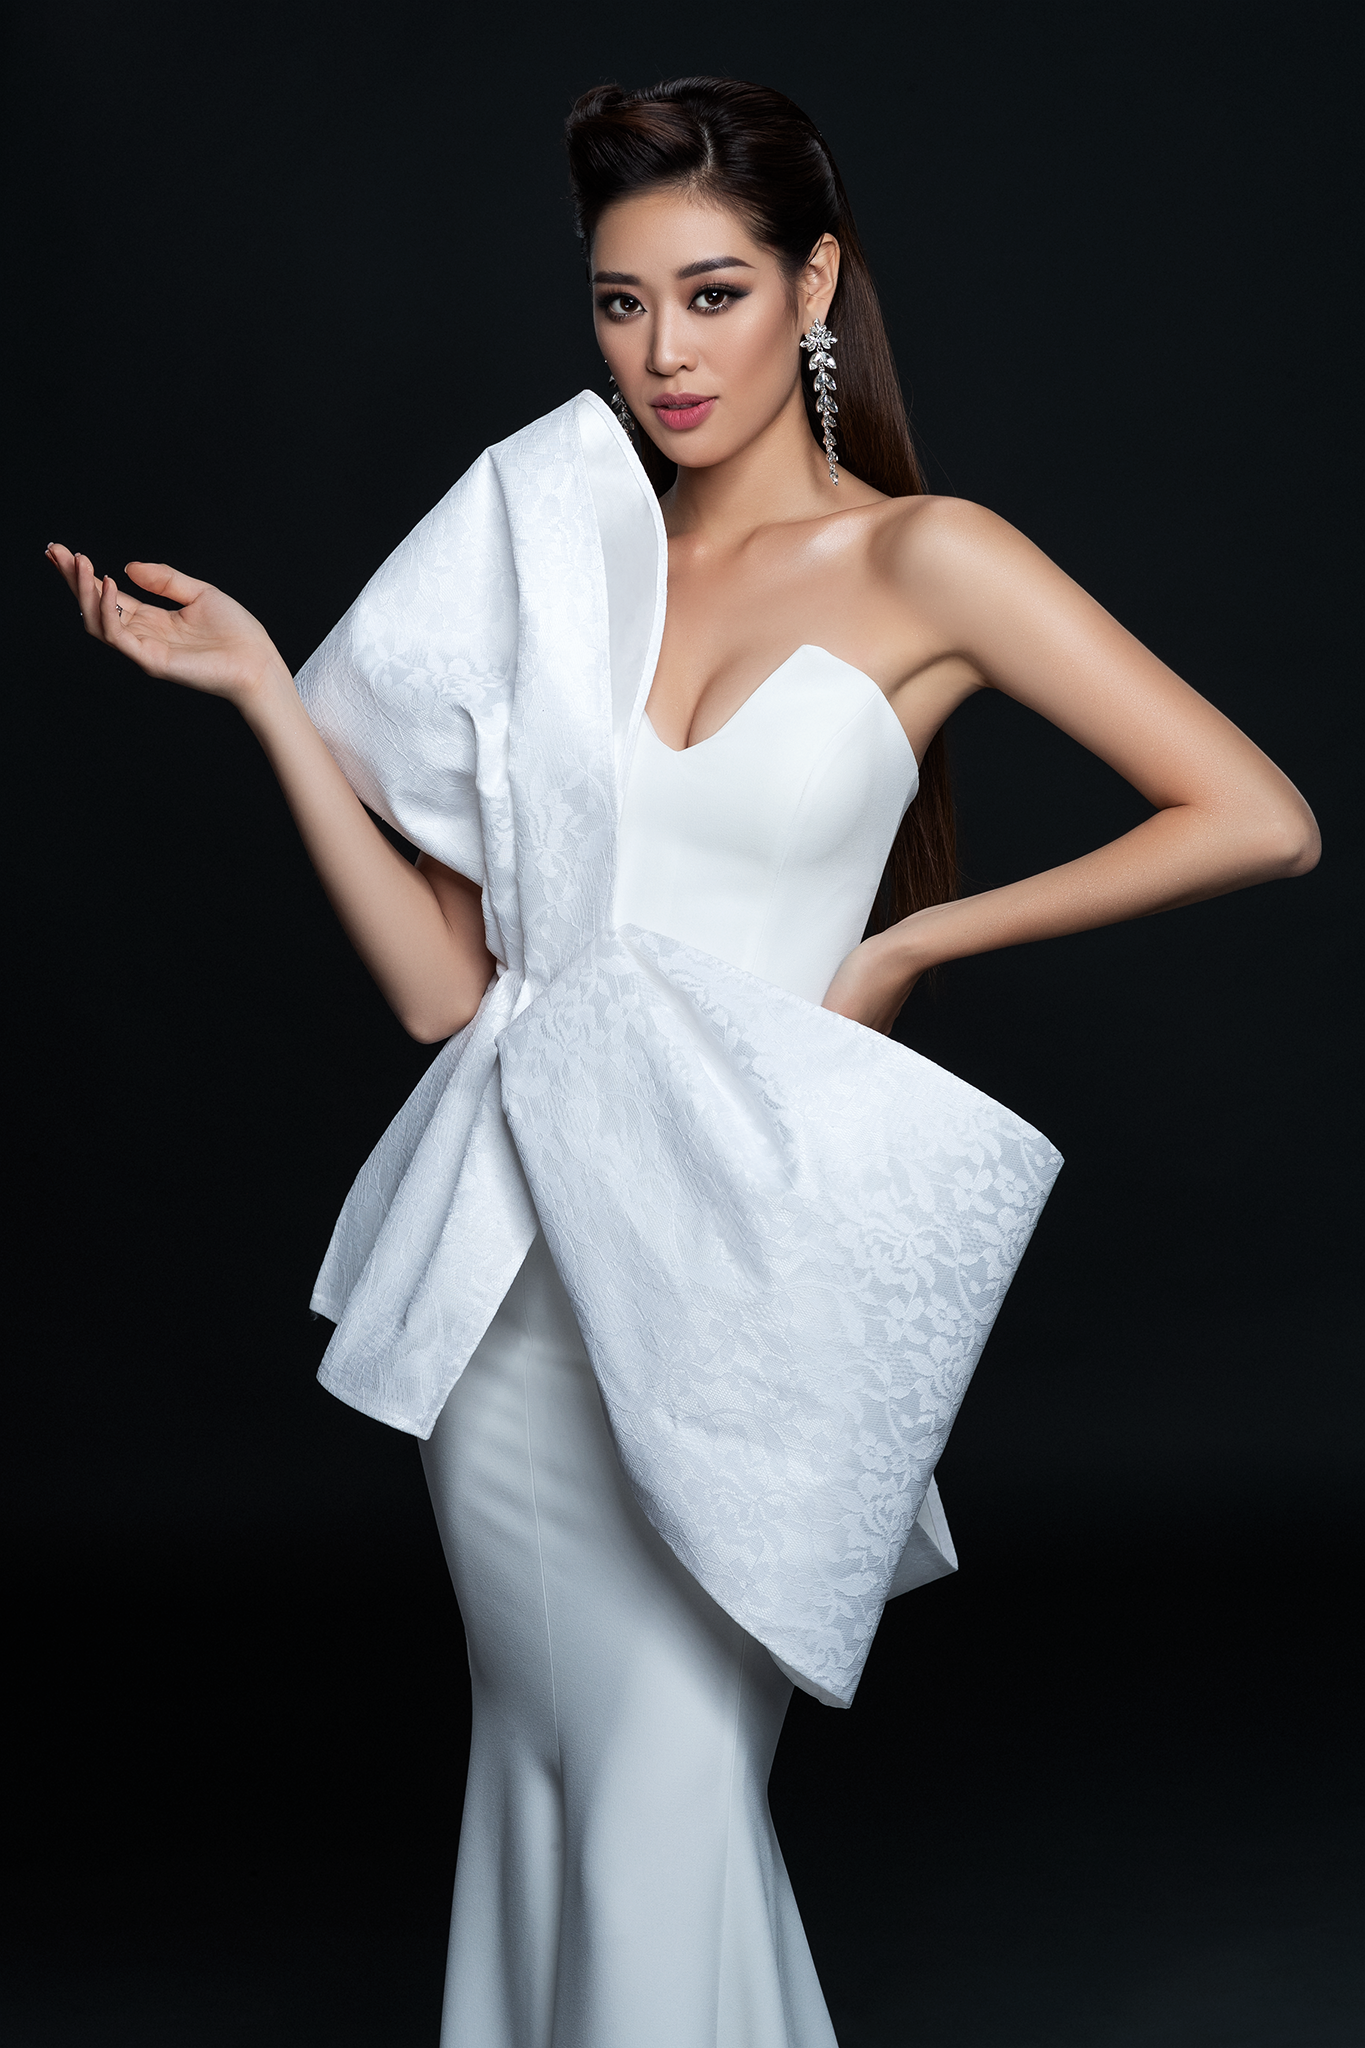 Hoa hau Khanh Van_Dress by Minh Tu (5)